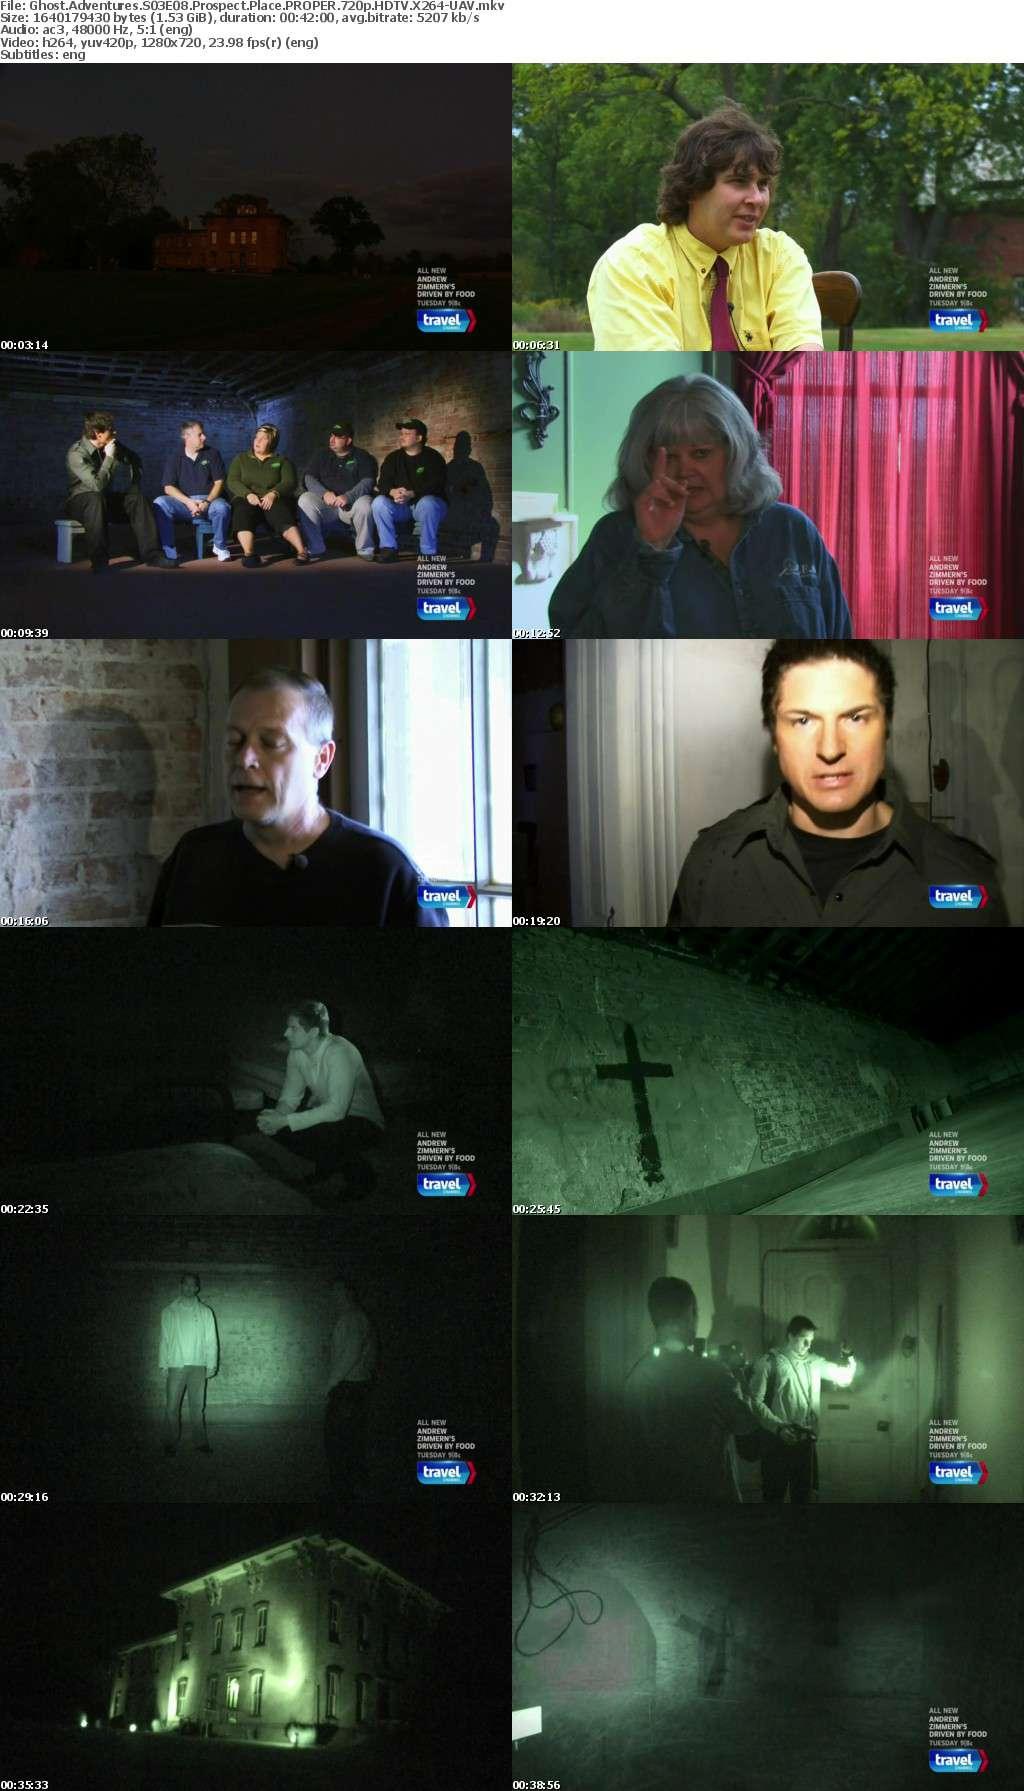 Ghost Adventures S03E08 Prospect Place PROPER 720p HDTV X264-UAV